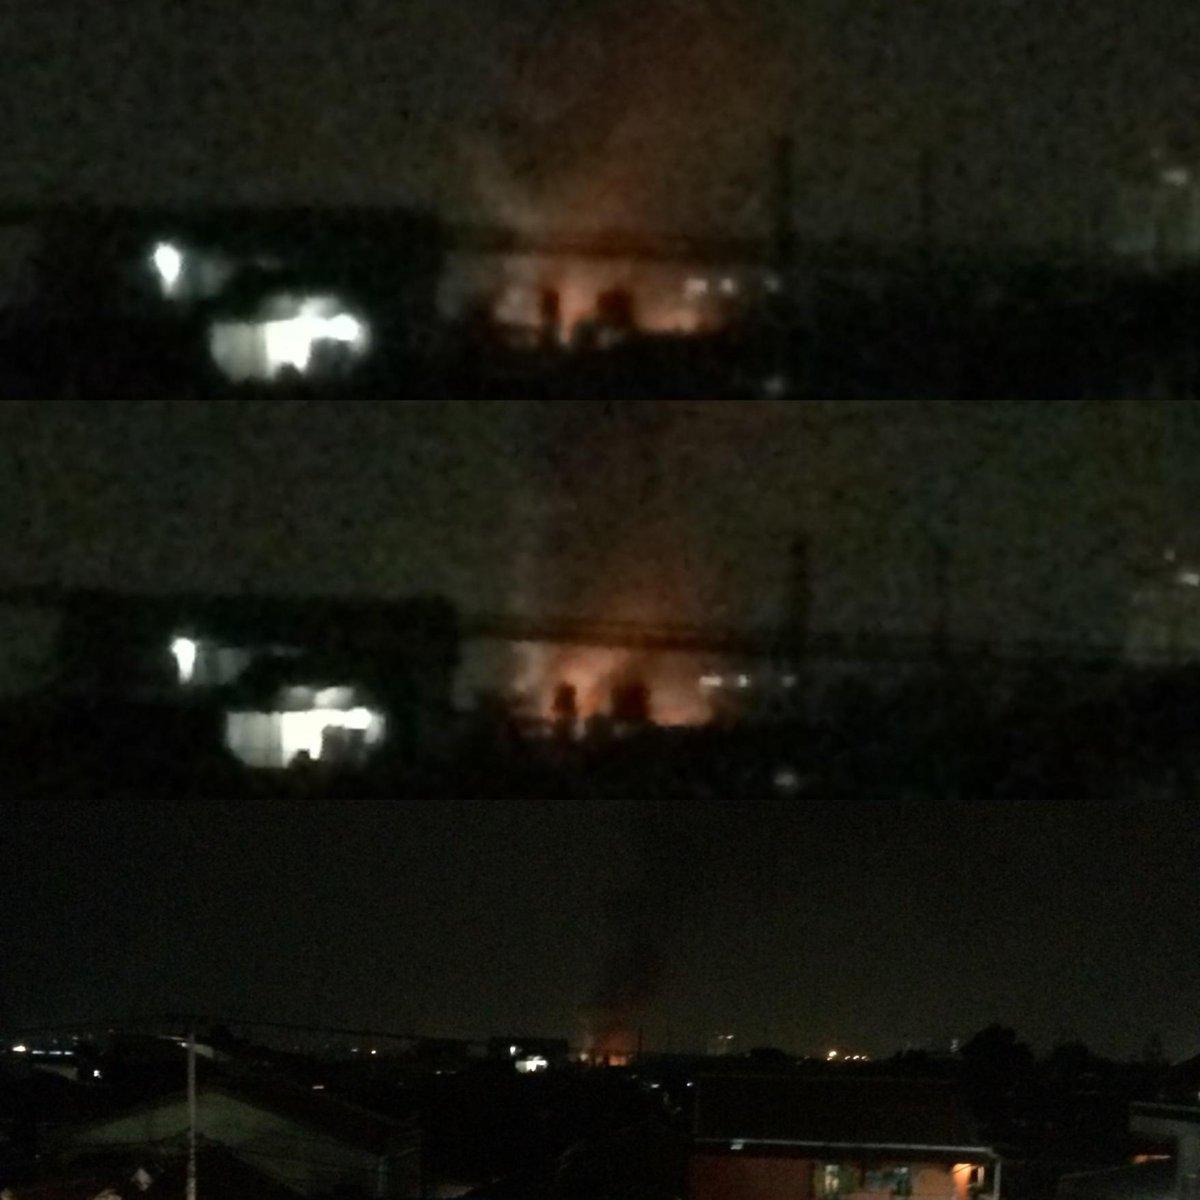 Kebakaran jalan industri @infocibeureum @infocimohay  @infobdg http://t.co/f5q6qPH3d1